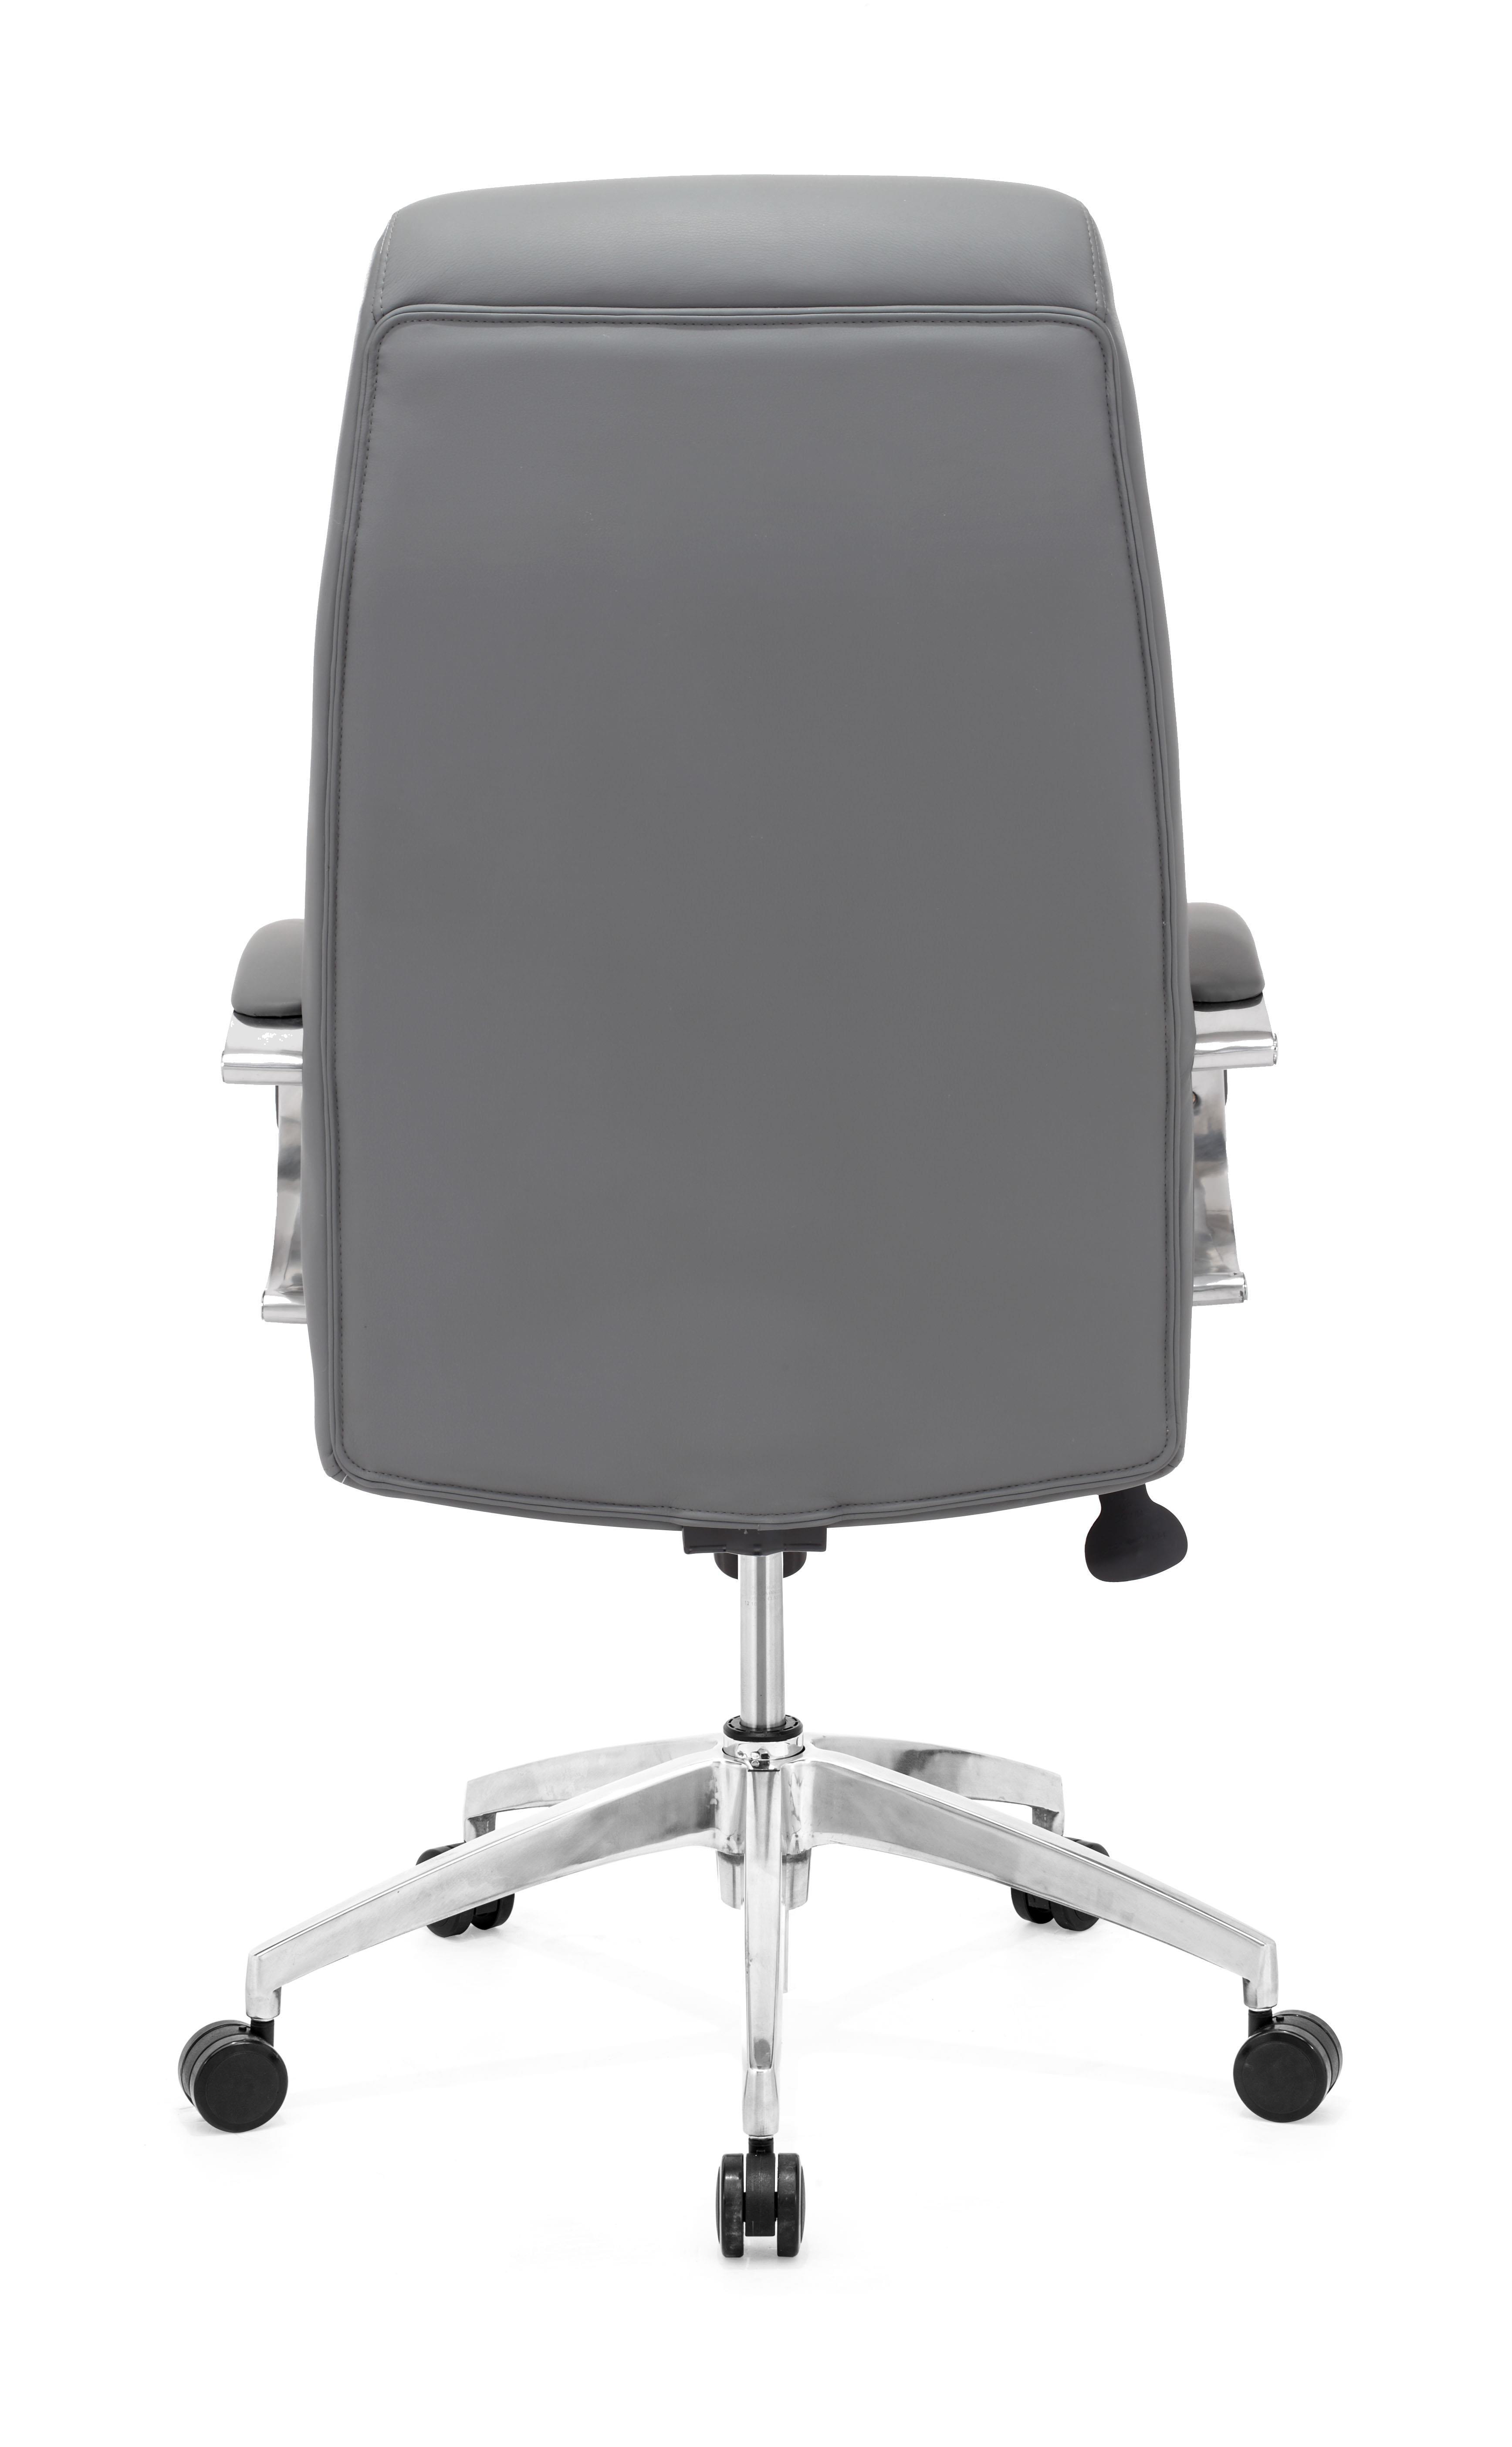 Zuo Modern Lider Comfort Office Chair White Lider Comfort Office Chair Walmart Com Walmart Com